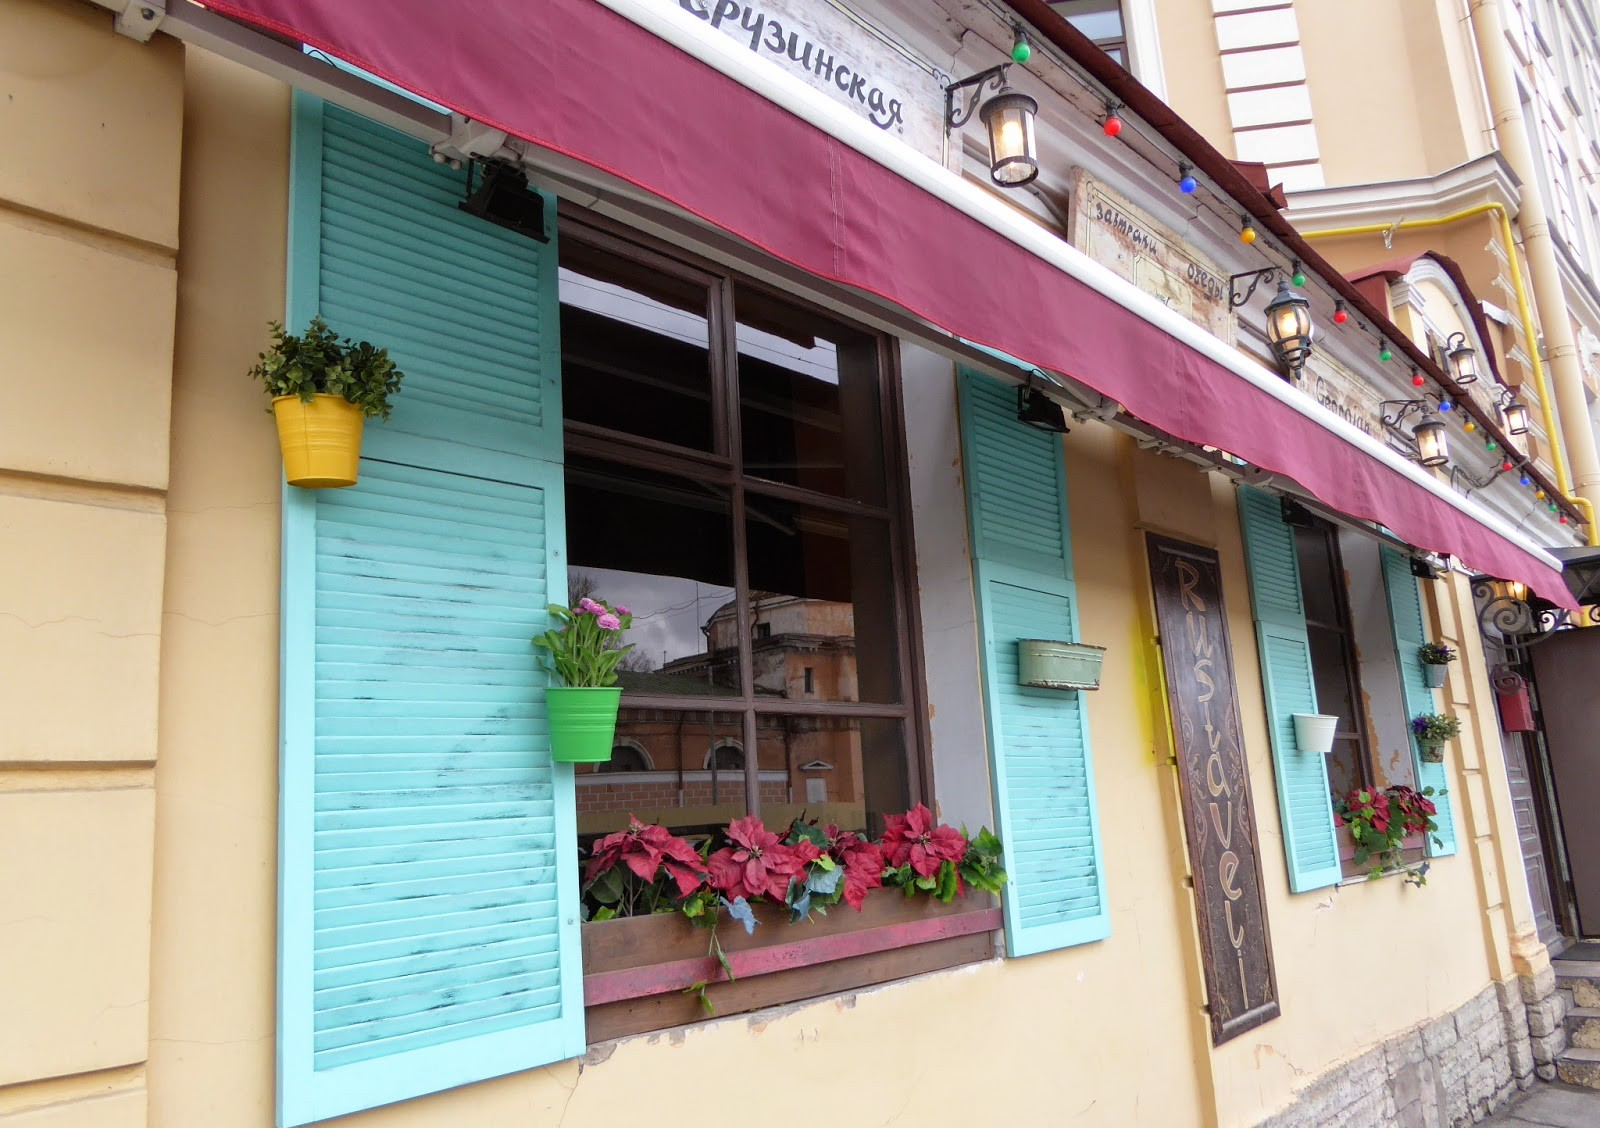 rustaveli restaurant st petersburg russia onde comer comida georgiana - georgian food